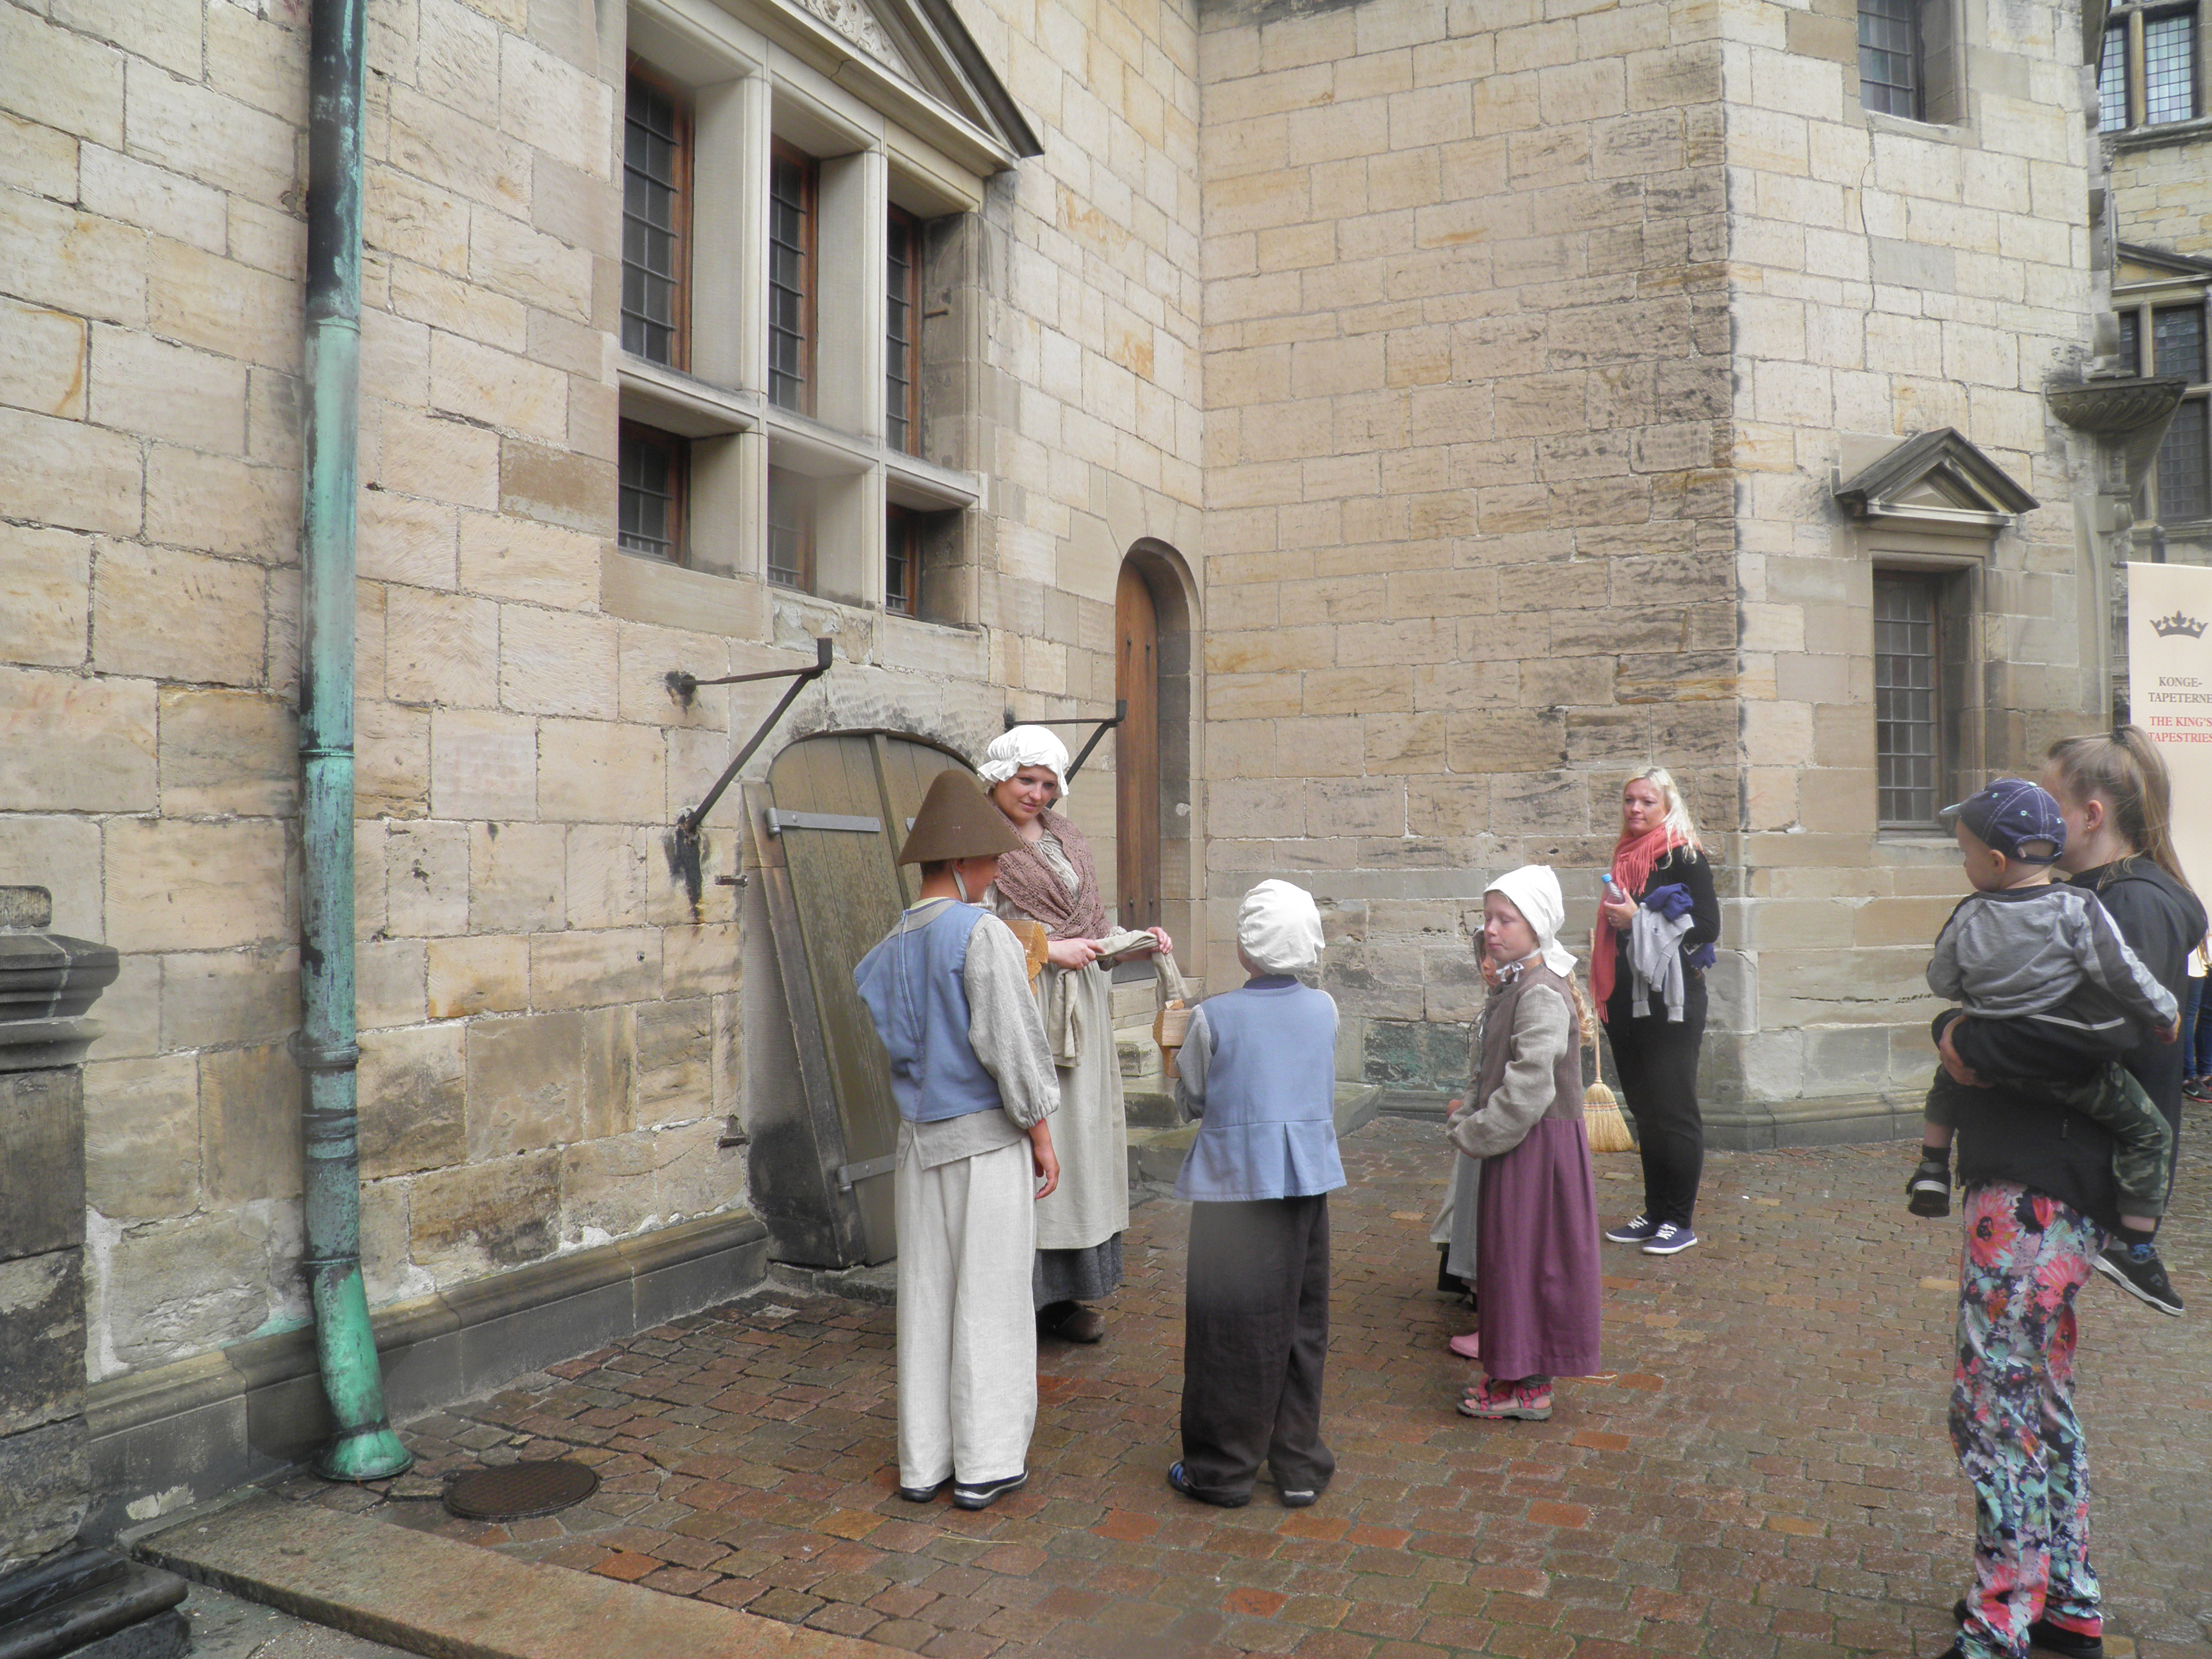 Rievocazione antichi costumi d'epoca - Kronborg Castle